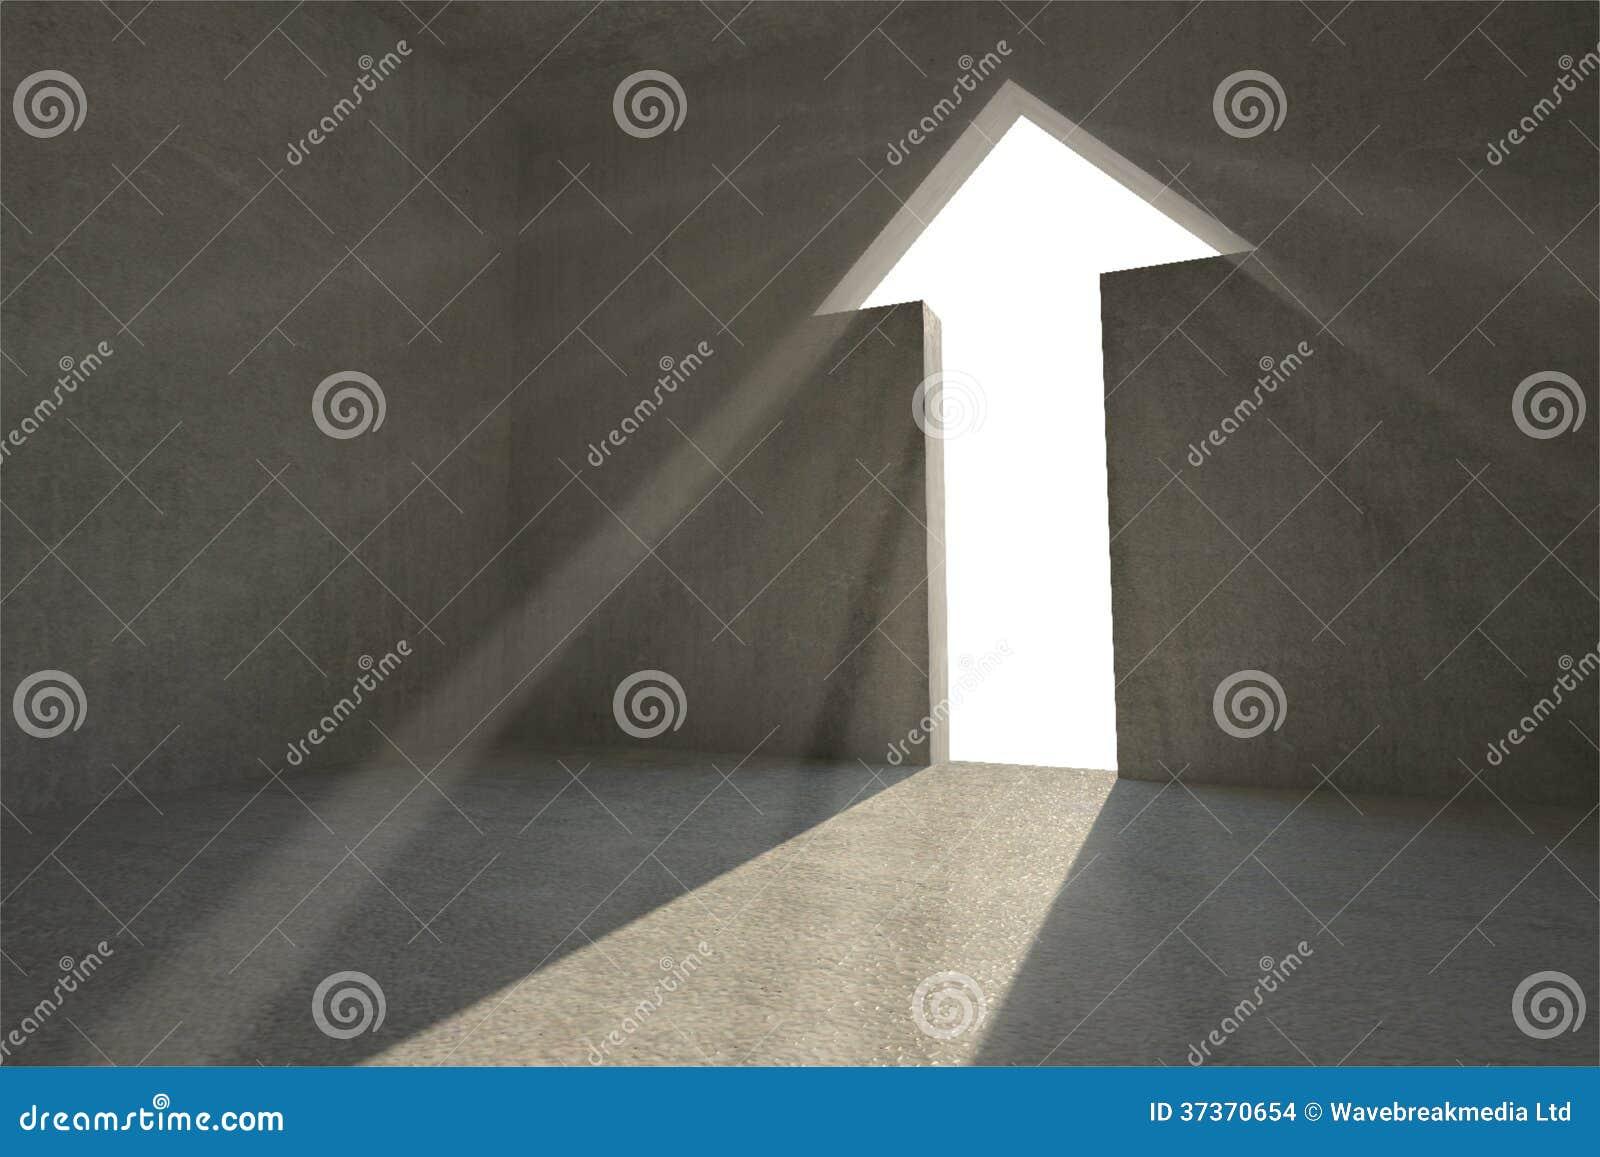 Grey room with arrow door & Grey Room With Arrow Door Stock Images - Image: 37370654 Pezcame.Com